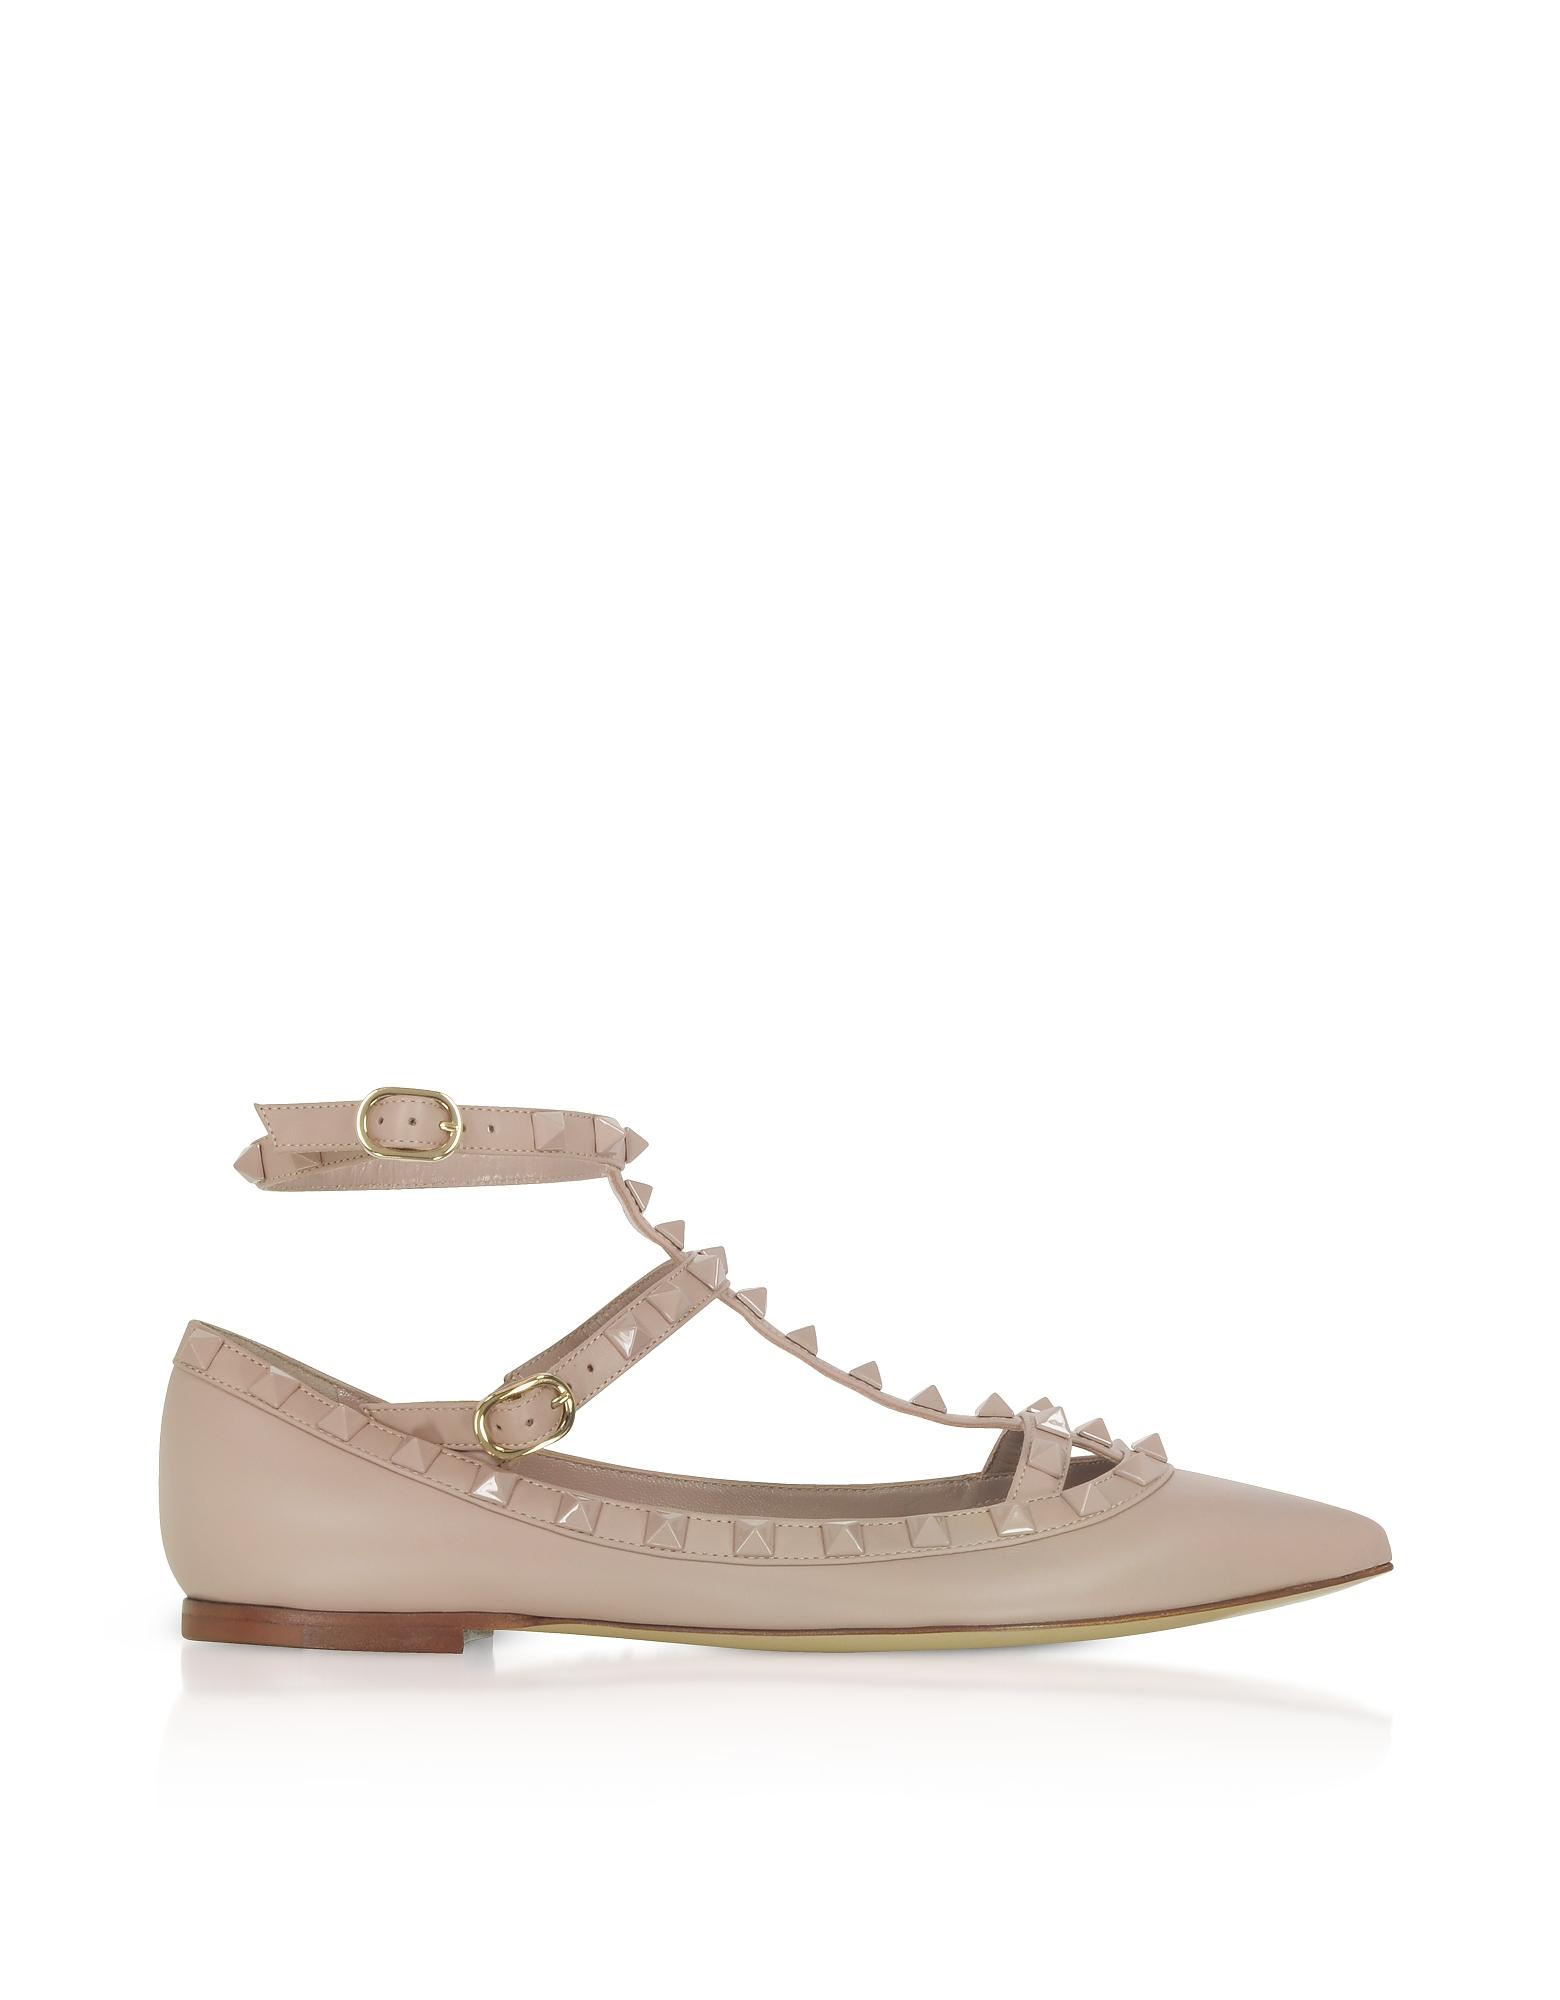 Valentino Shoes, Powder Pink Rockstud Ballerinas